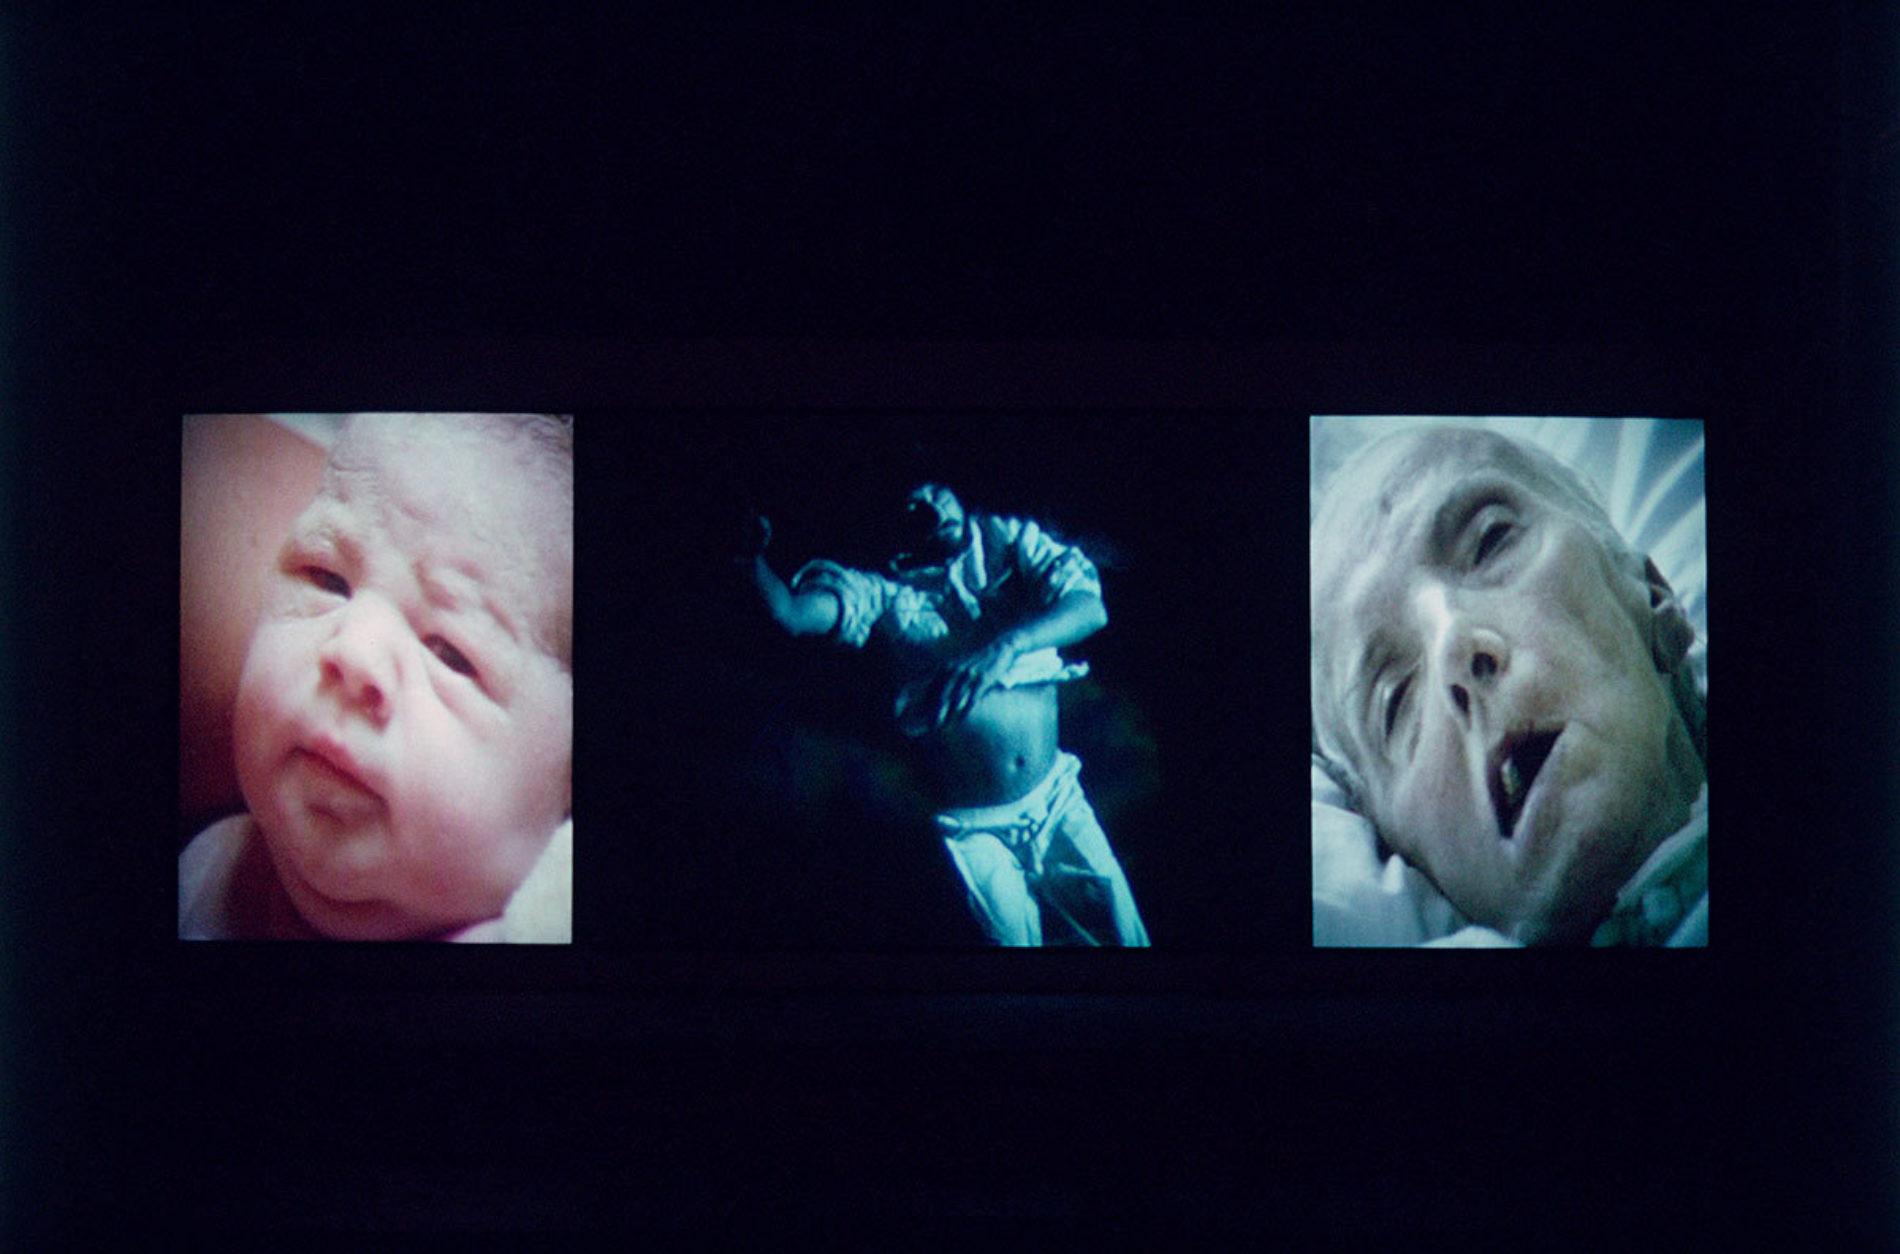 Bill Viola / Michelangelo. Life Death Rebirth. 26 January — 31 March 2019